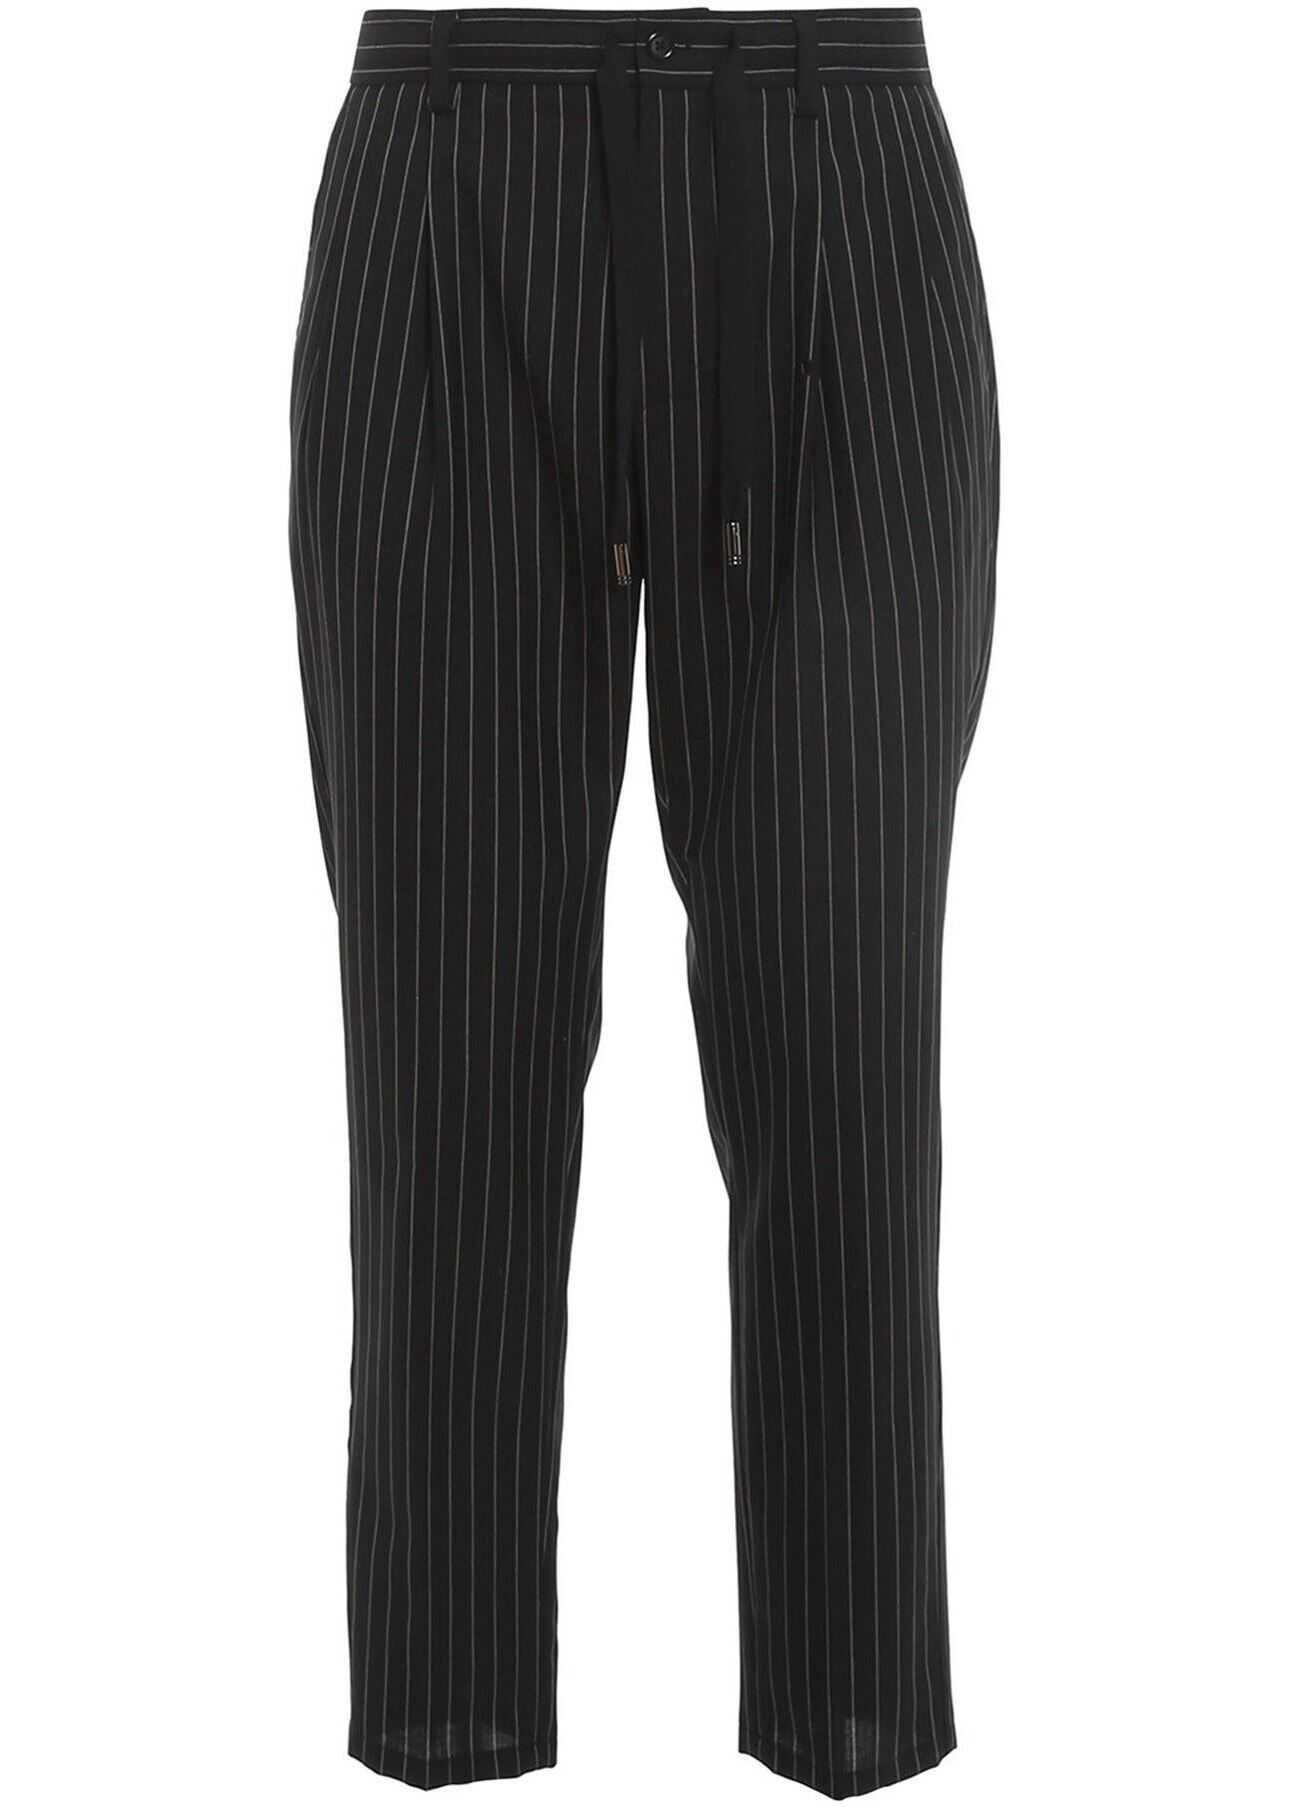 Dolce & Gabbana Pinstriped Brushed Wool Trousers In Black Black imagine